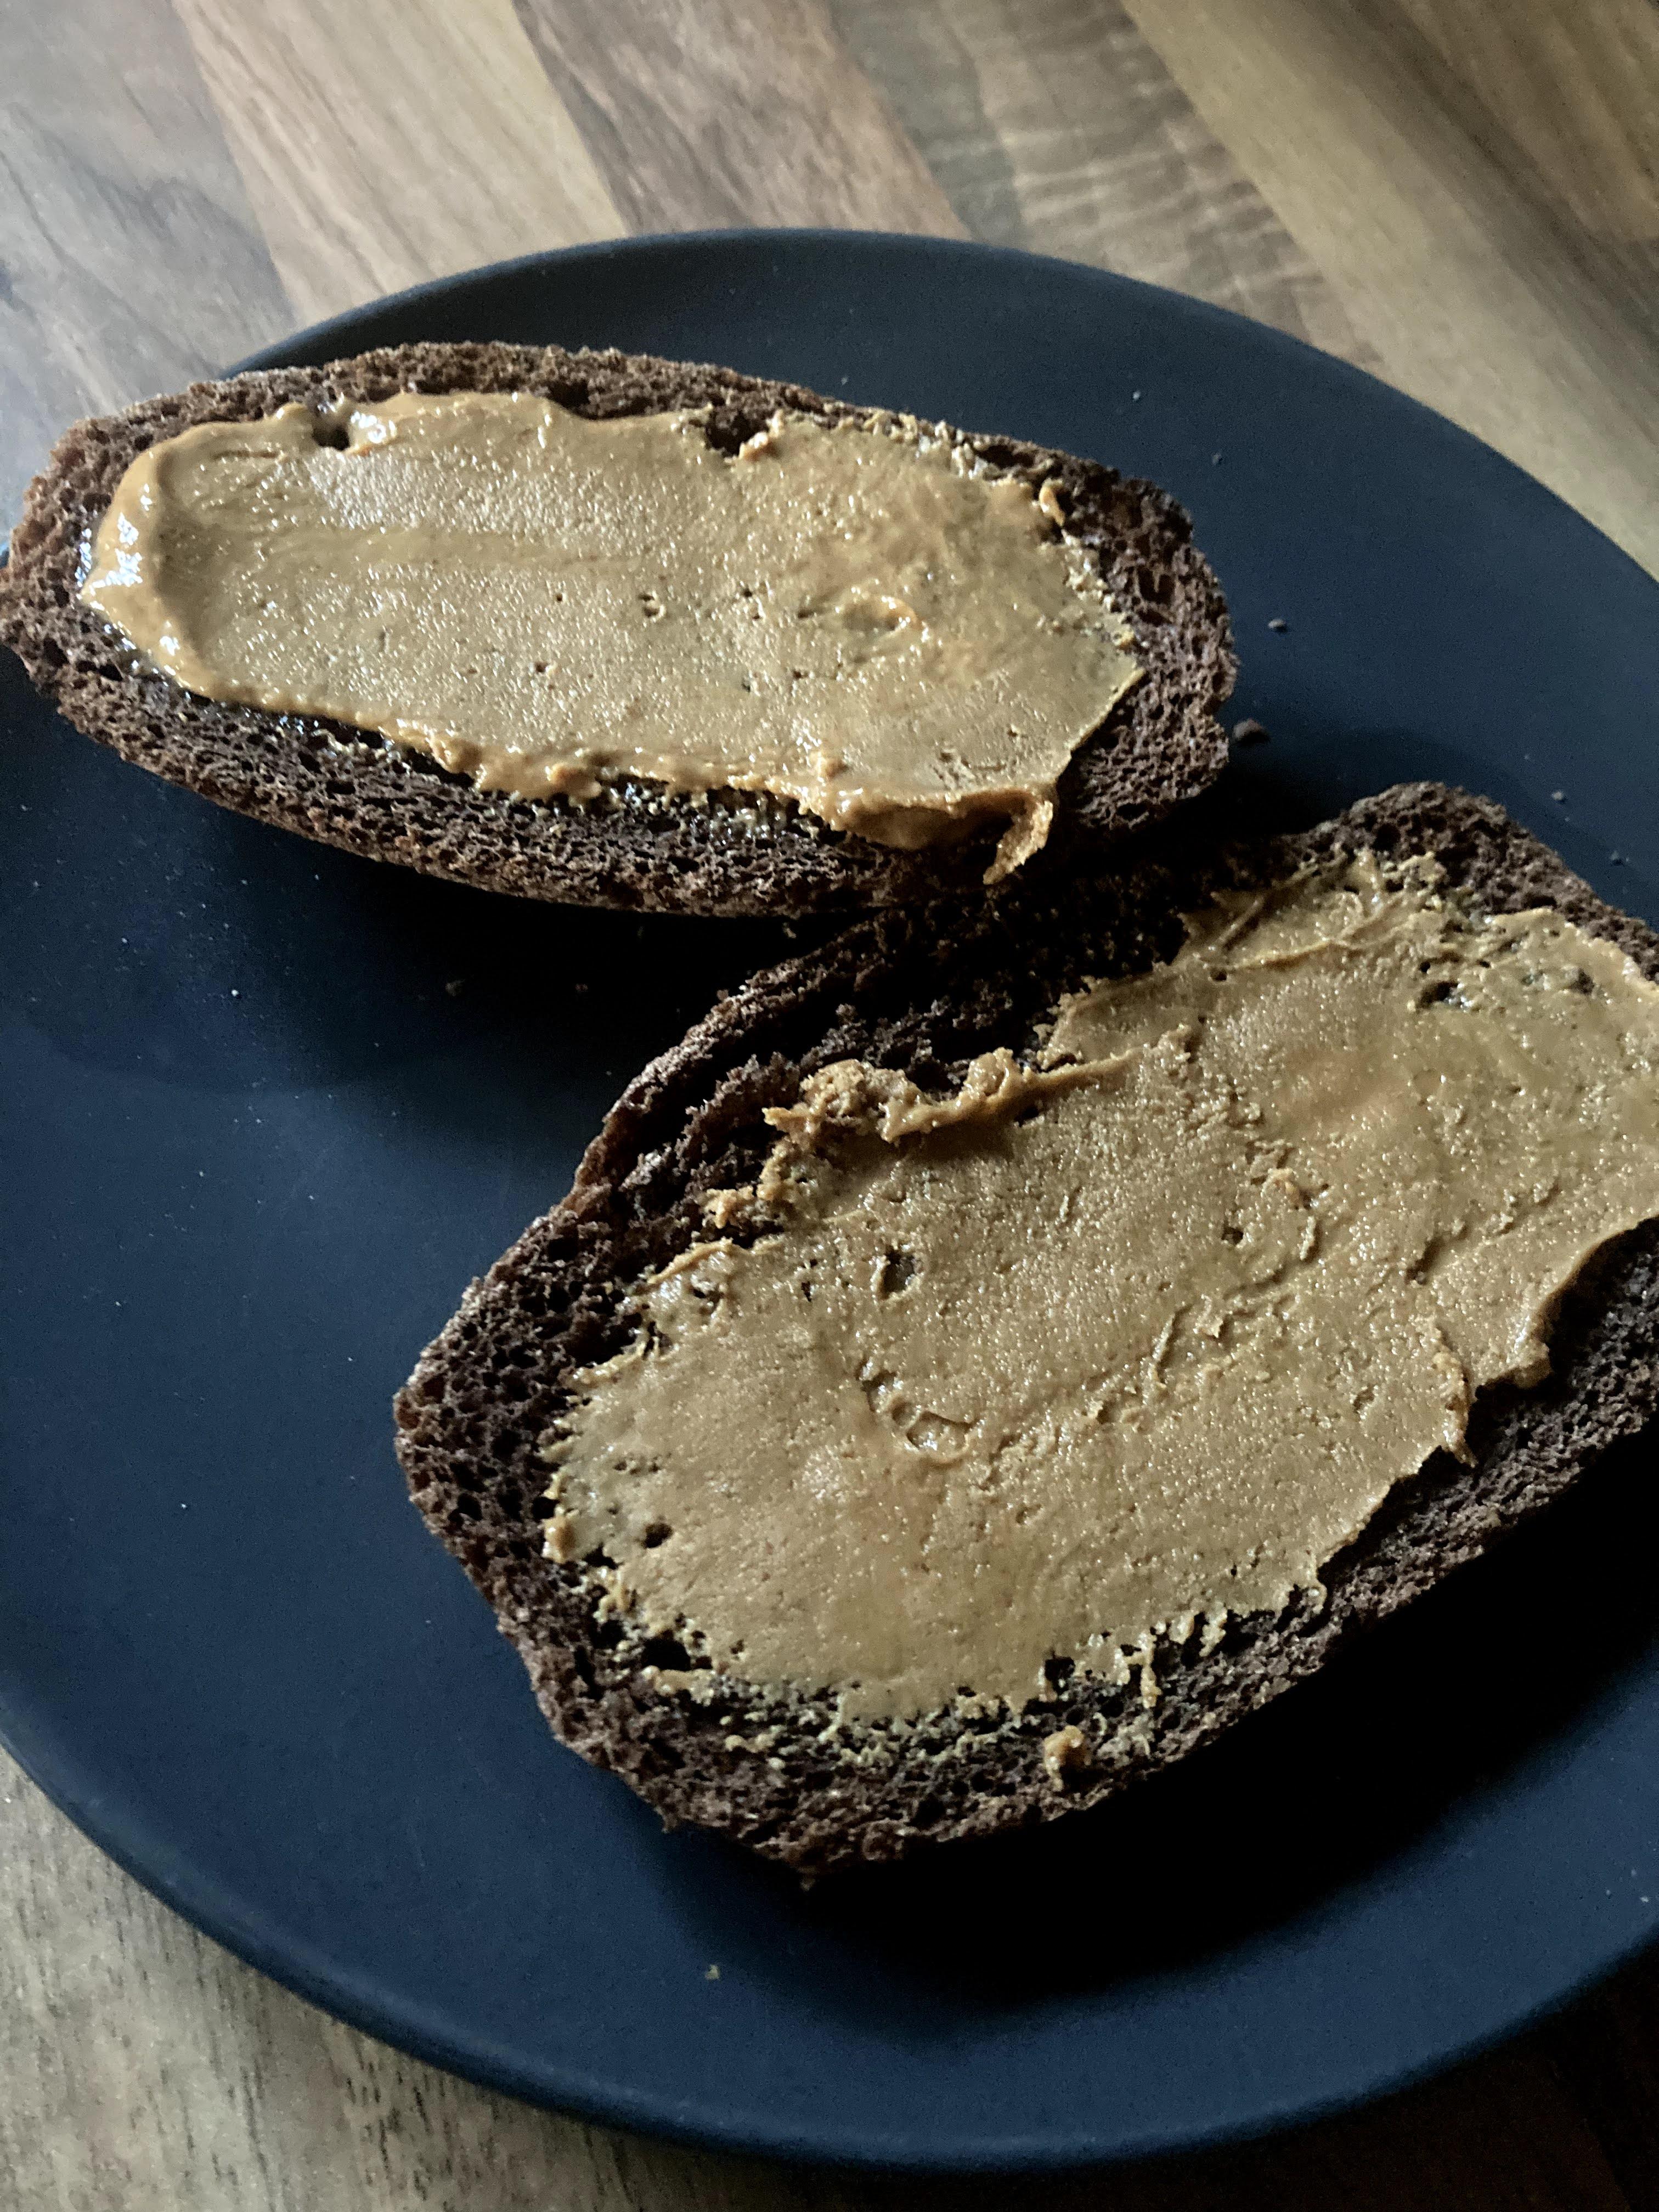 Vegan Chocolate Bread (for a bread machine)